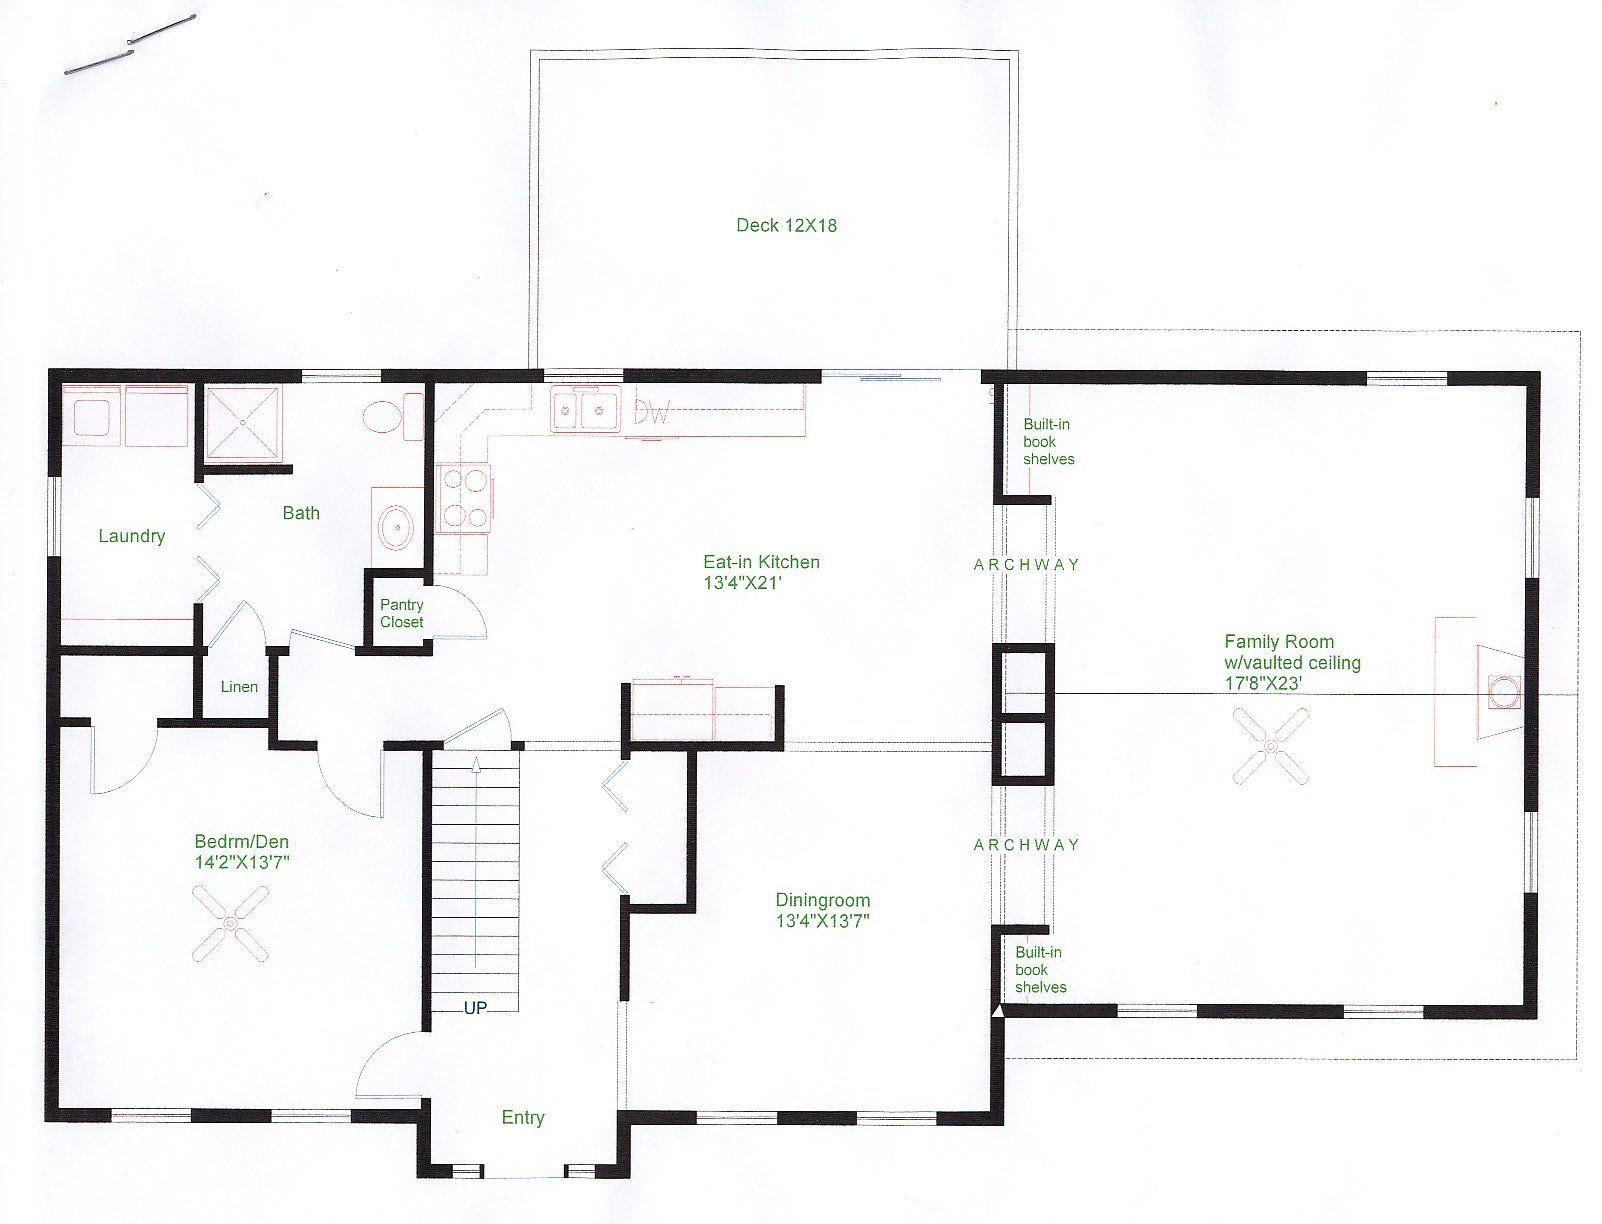 Floorplan Example Of Cape Style Home Floorplans Pinterest